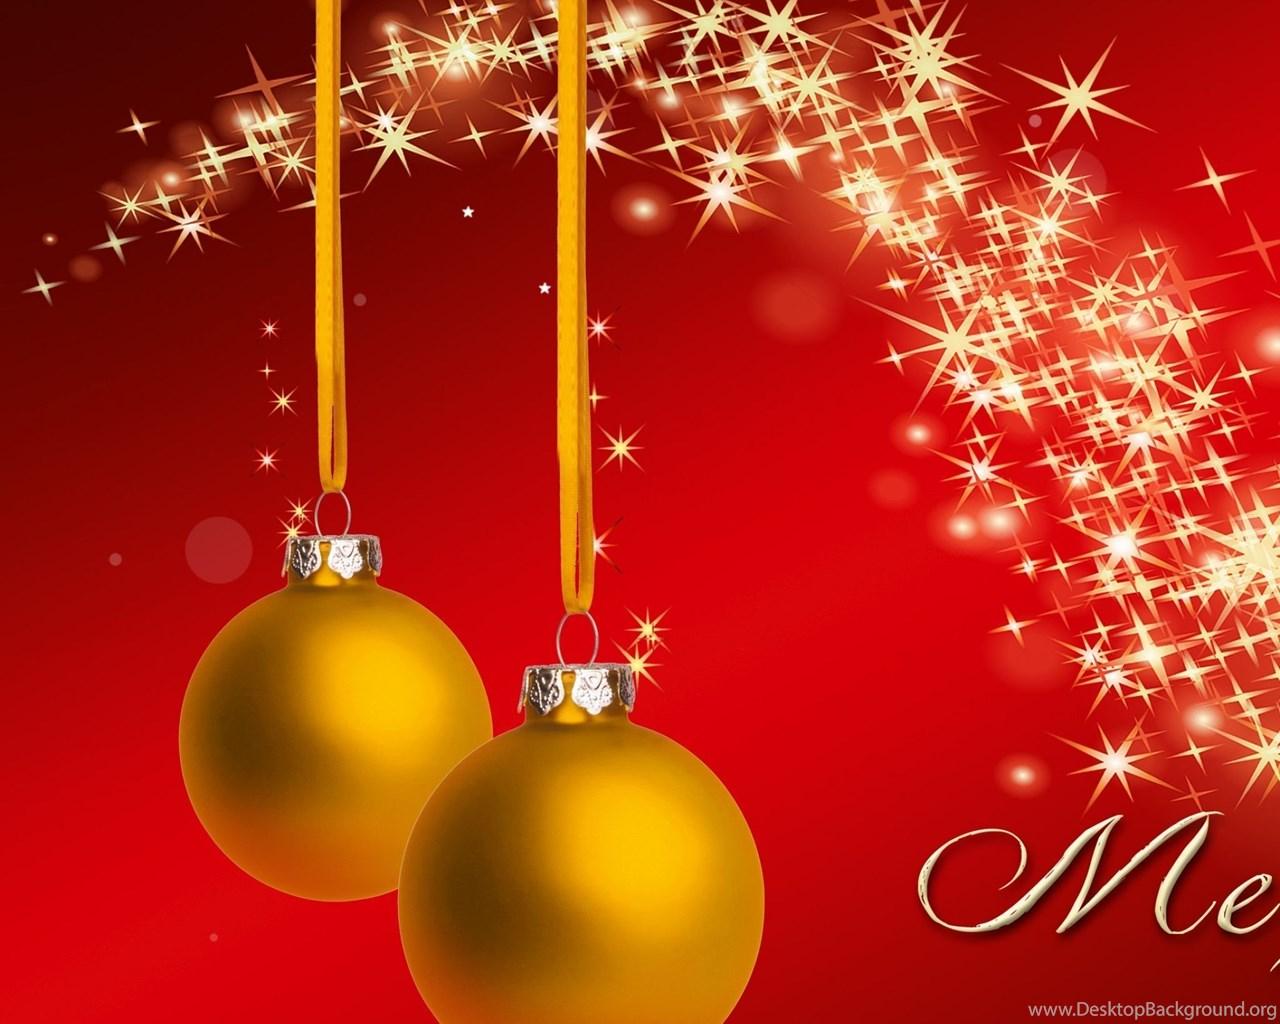 Ipad Christmas Wallpaper Hd: New IPad Air, 4, 3, IPad Mini Retina Christmas Wallpapers